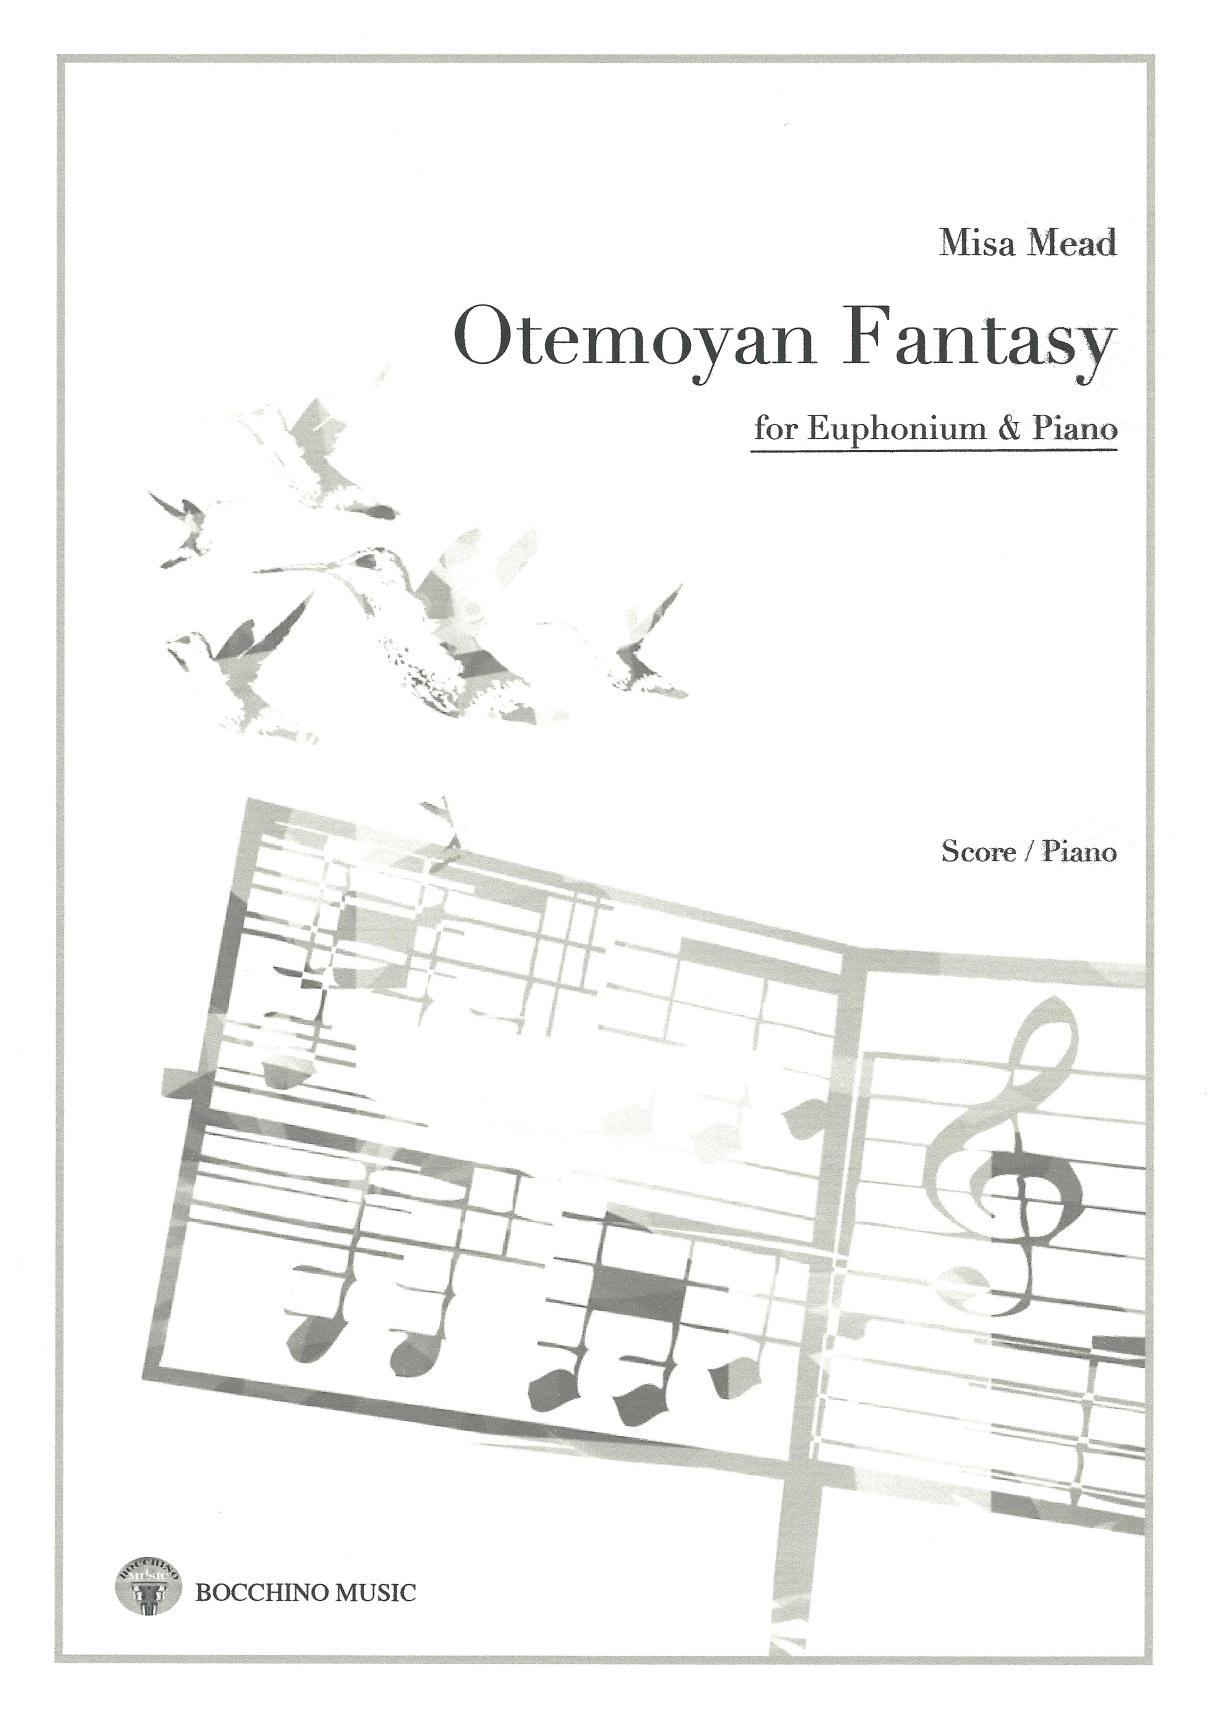 Otemoyan Fantasy - Misa Mead - for euphonium and piano